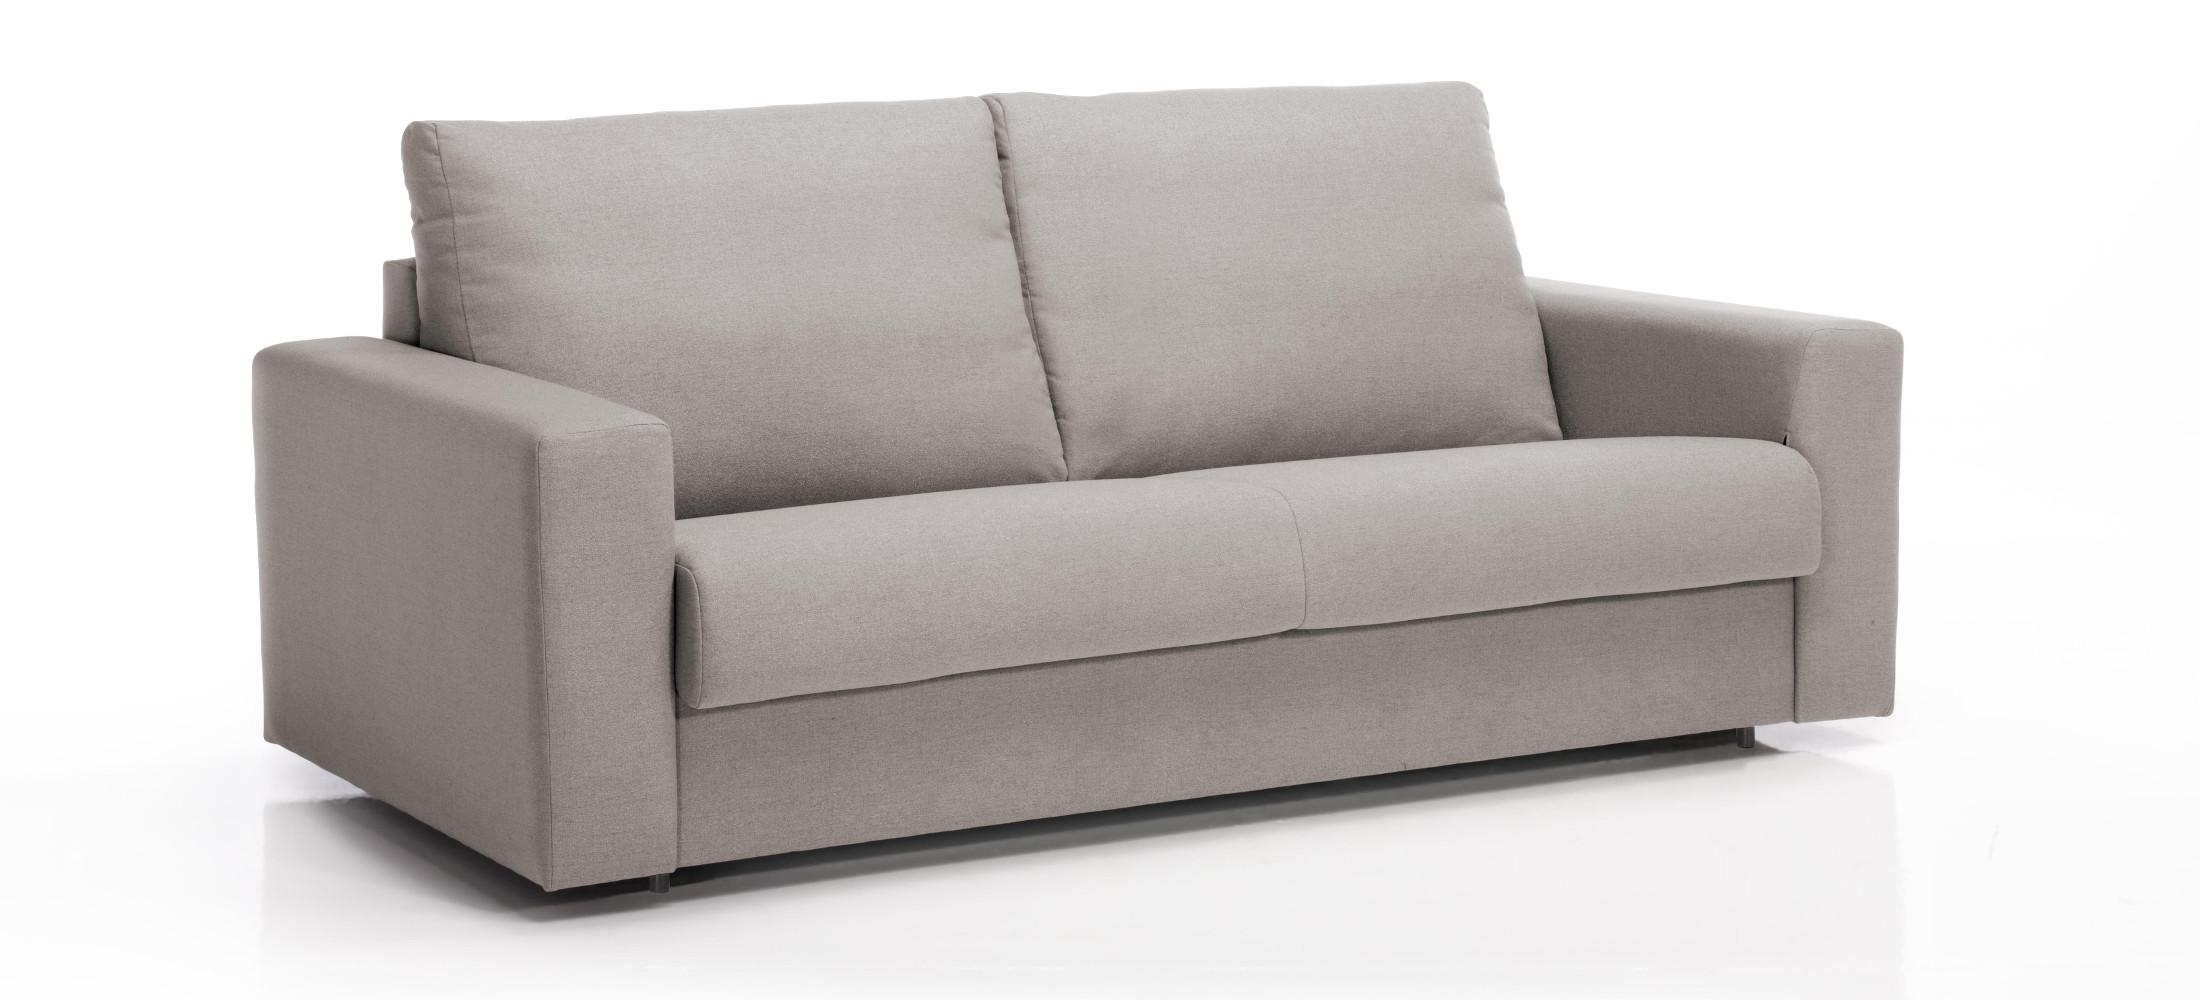 Sofá cama Rega- Vista lateral